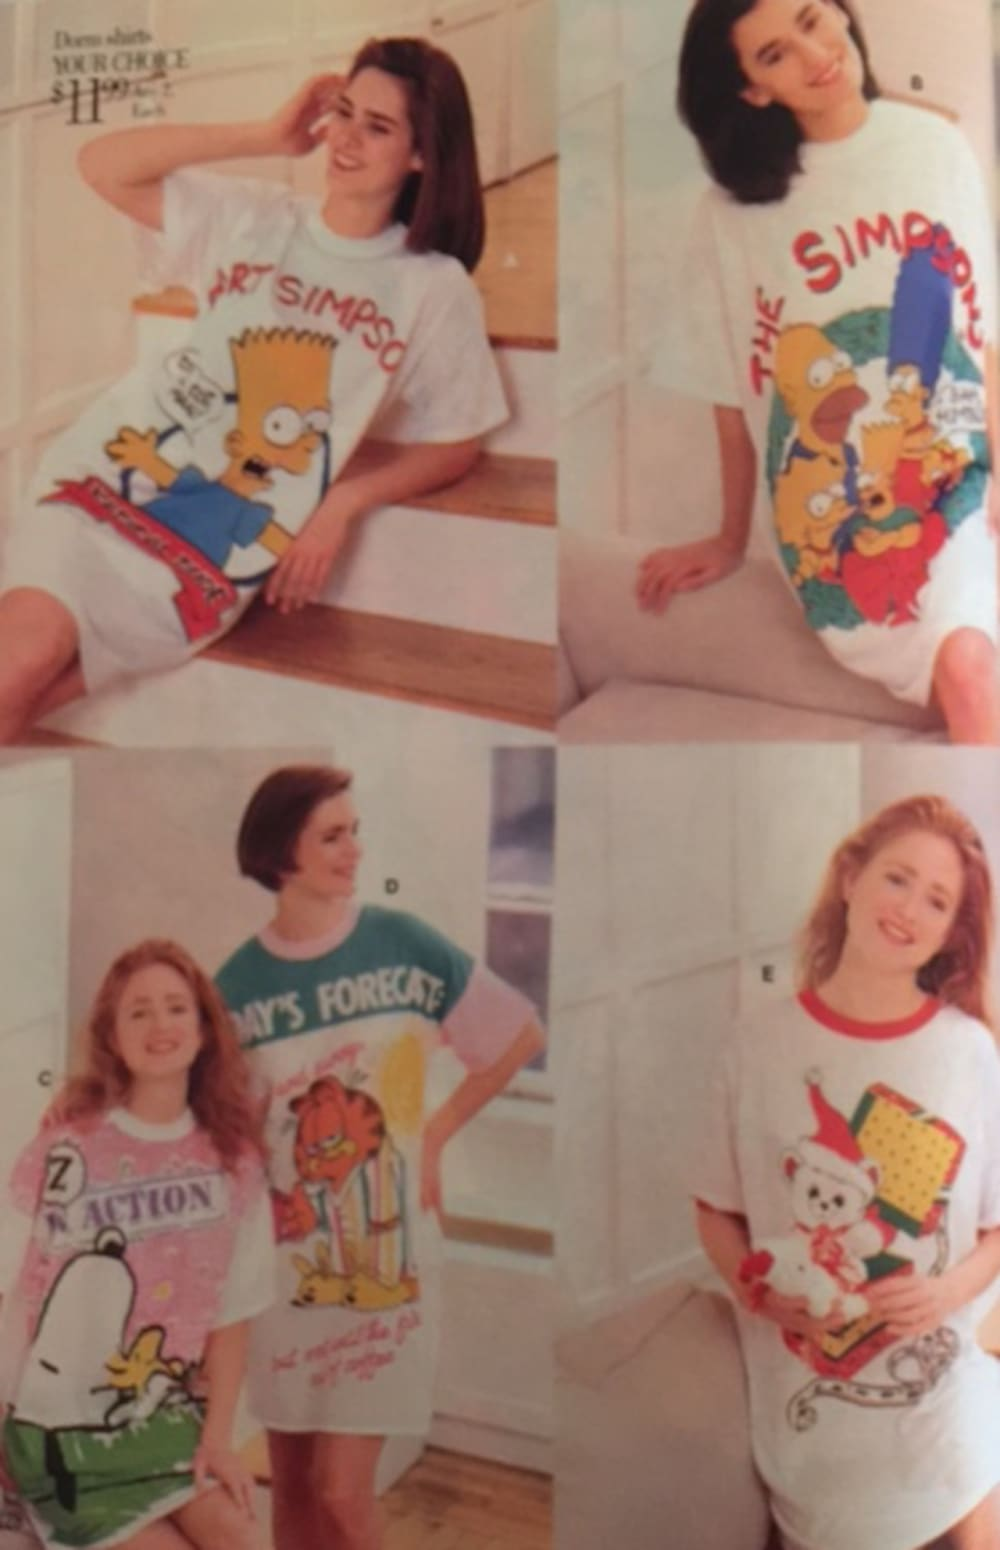 Peek Inside Sears's 1990 Holiday Wish Book   Mental Floss